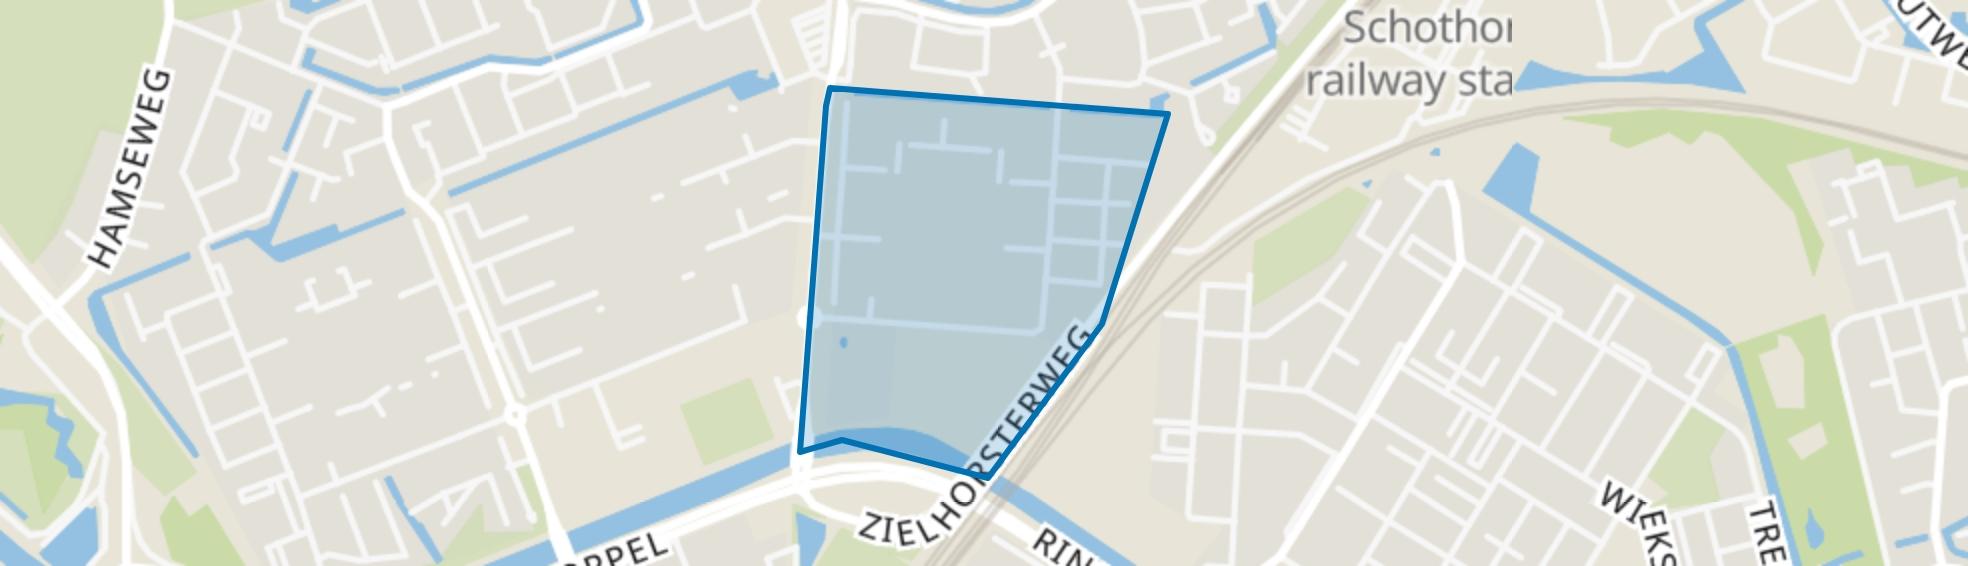 Koperhorst, Amersfoort map